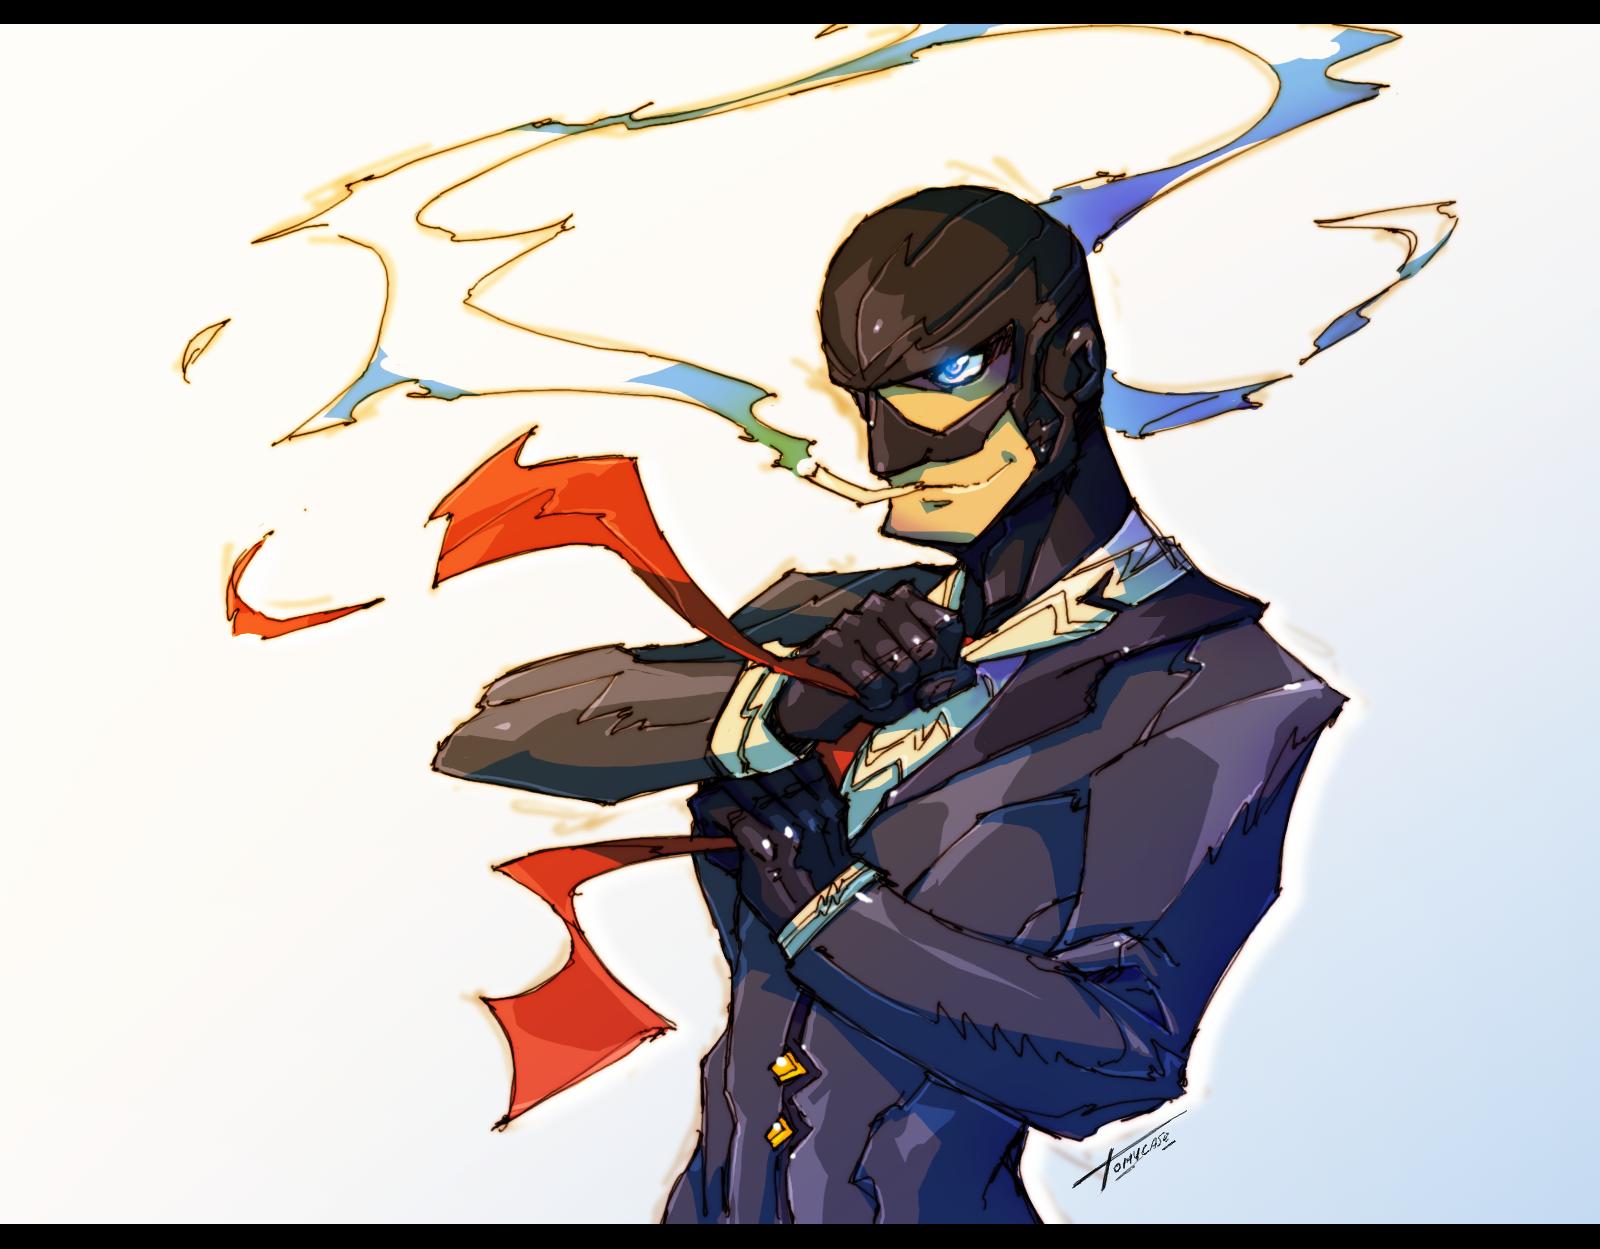 TF2 : The Spy